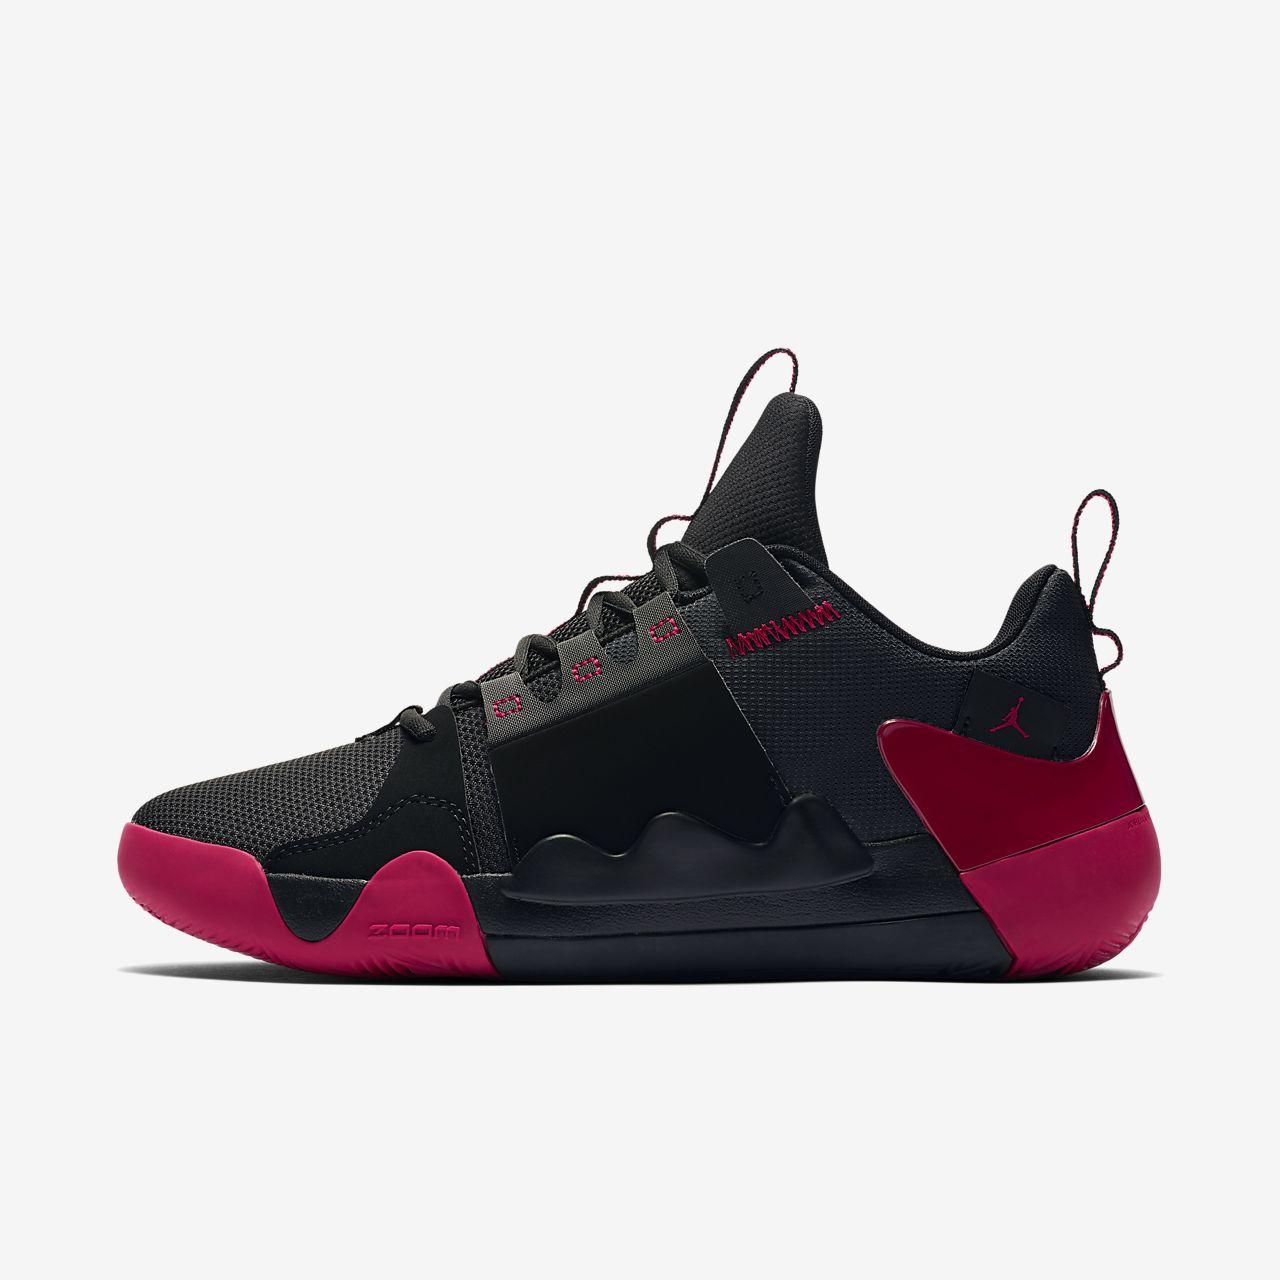 Basketbalová bota Jordan Zoom Zero Gravity